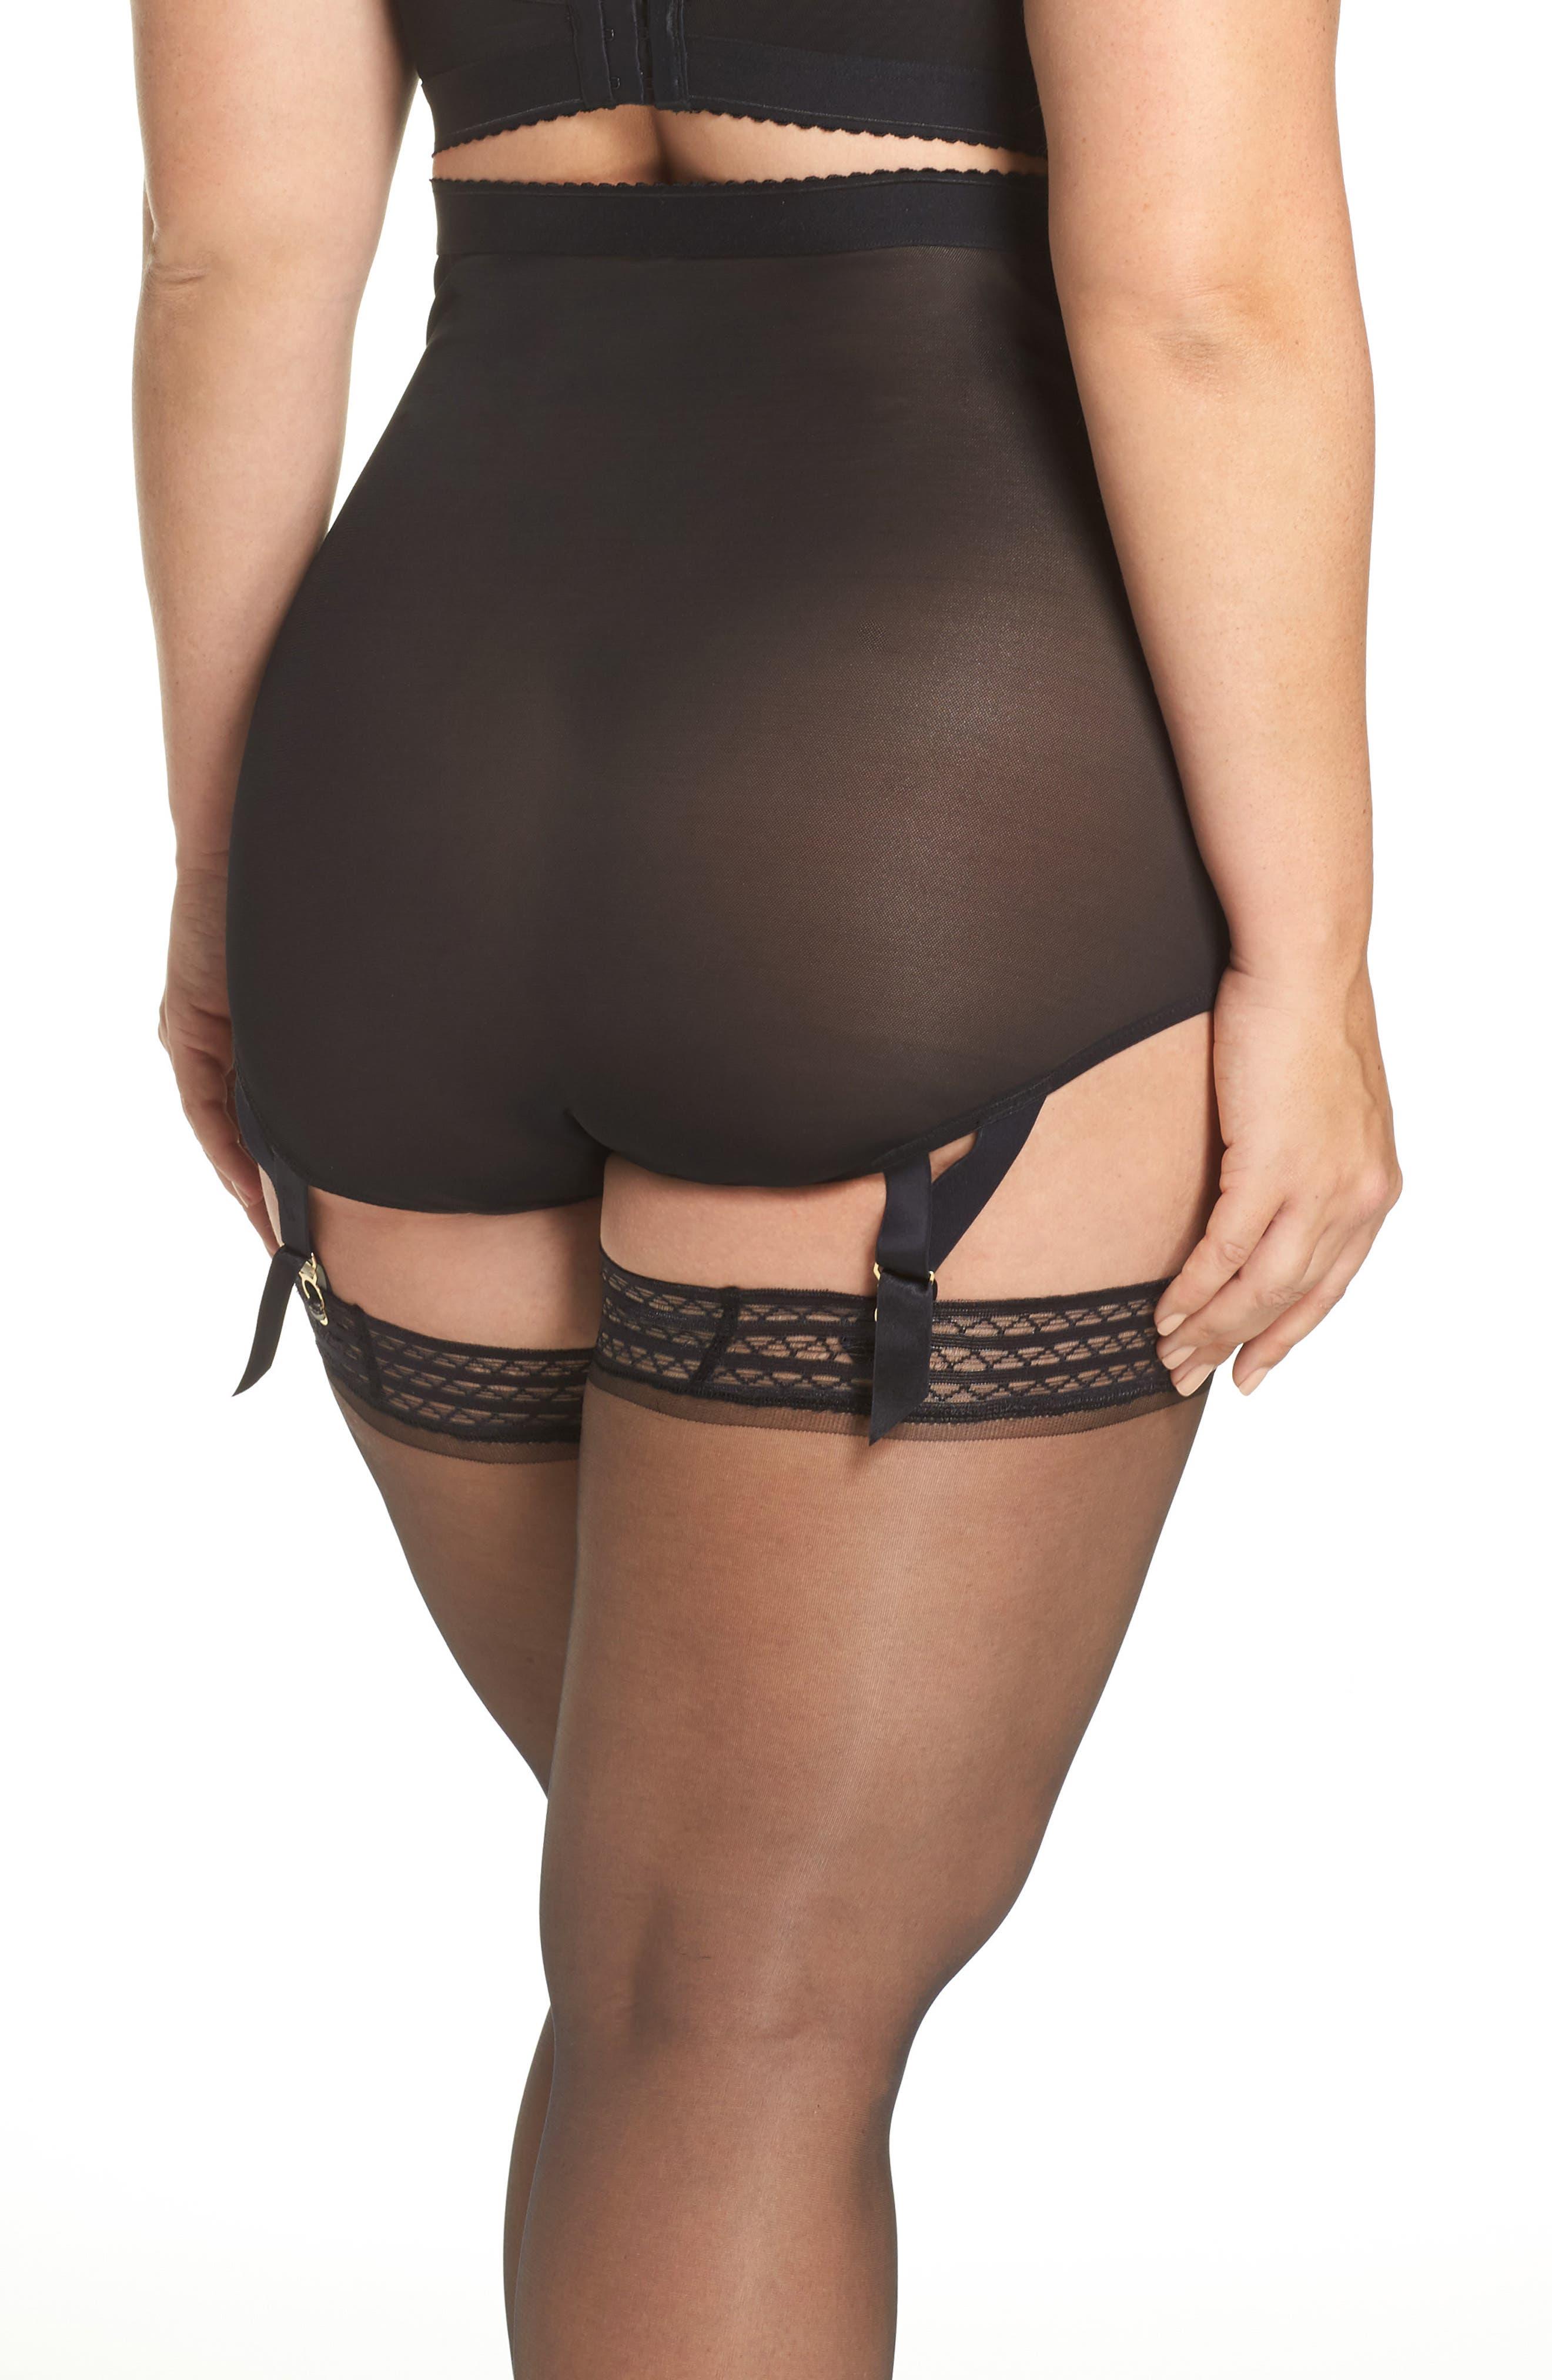 Candace Noir High Waist Panties with Garter Attachments,                             Alternate thumbnail 2, color,                             001